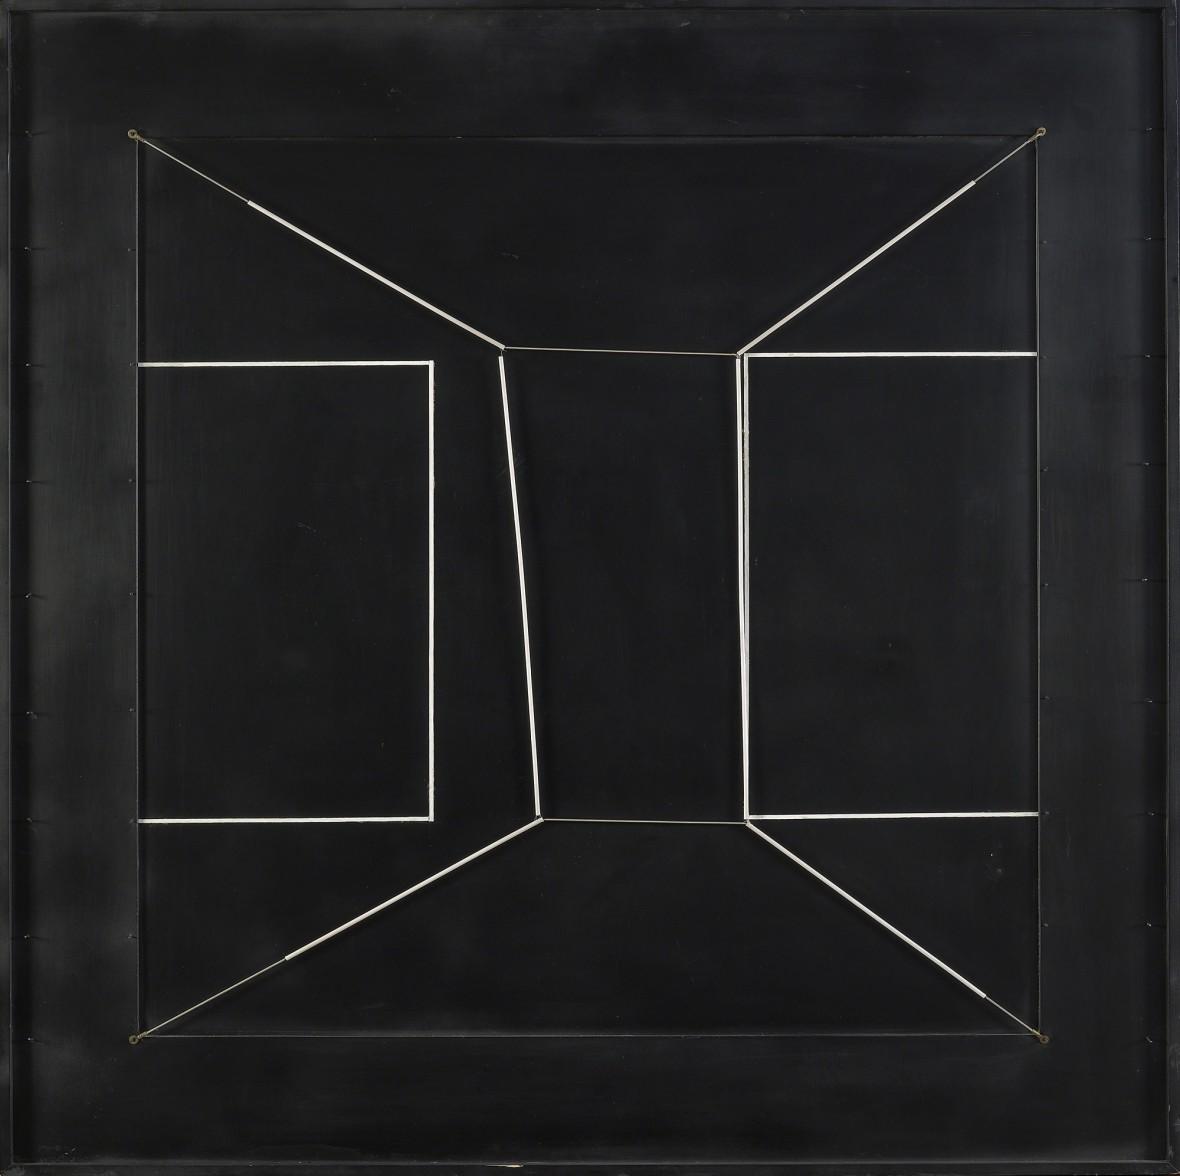 Spazio elastico intermutabile, due doppi quadrati incompiuti (Intermutable Elastic Space, Two Incomplete Double Squares)